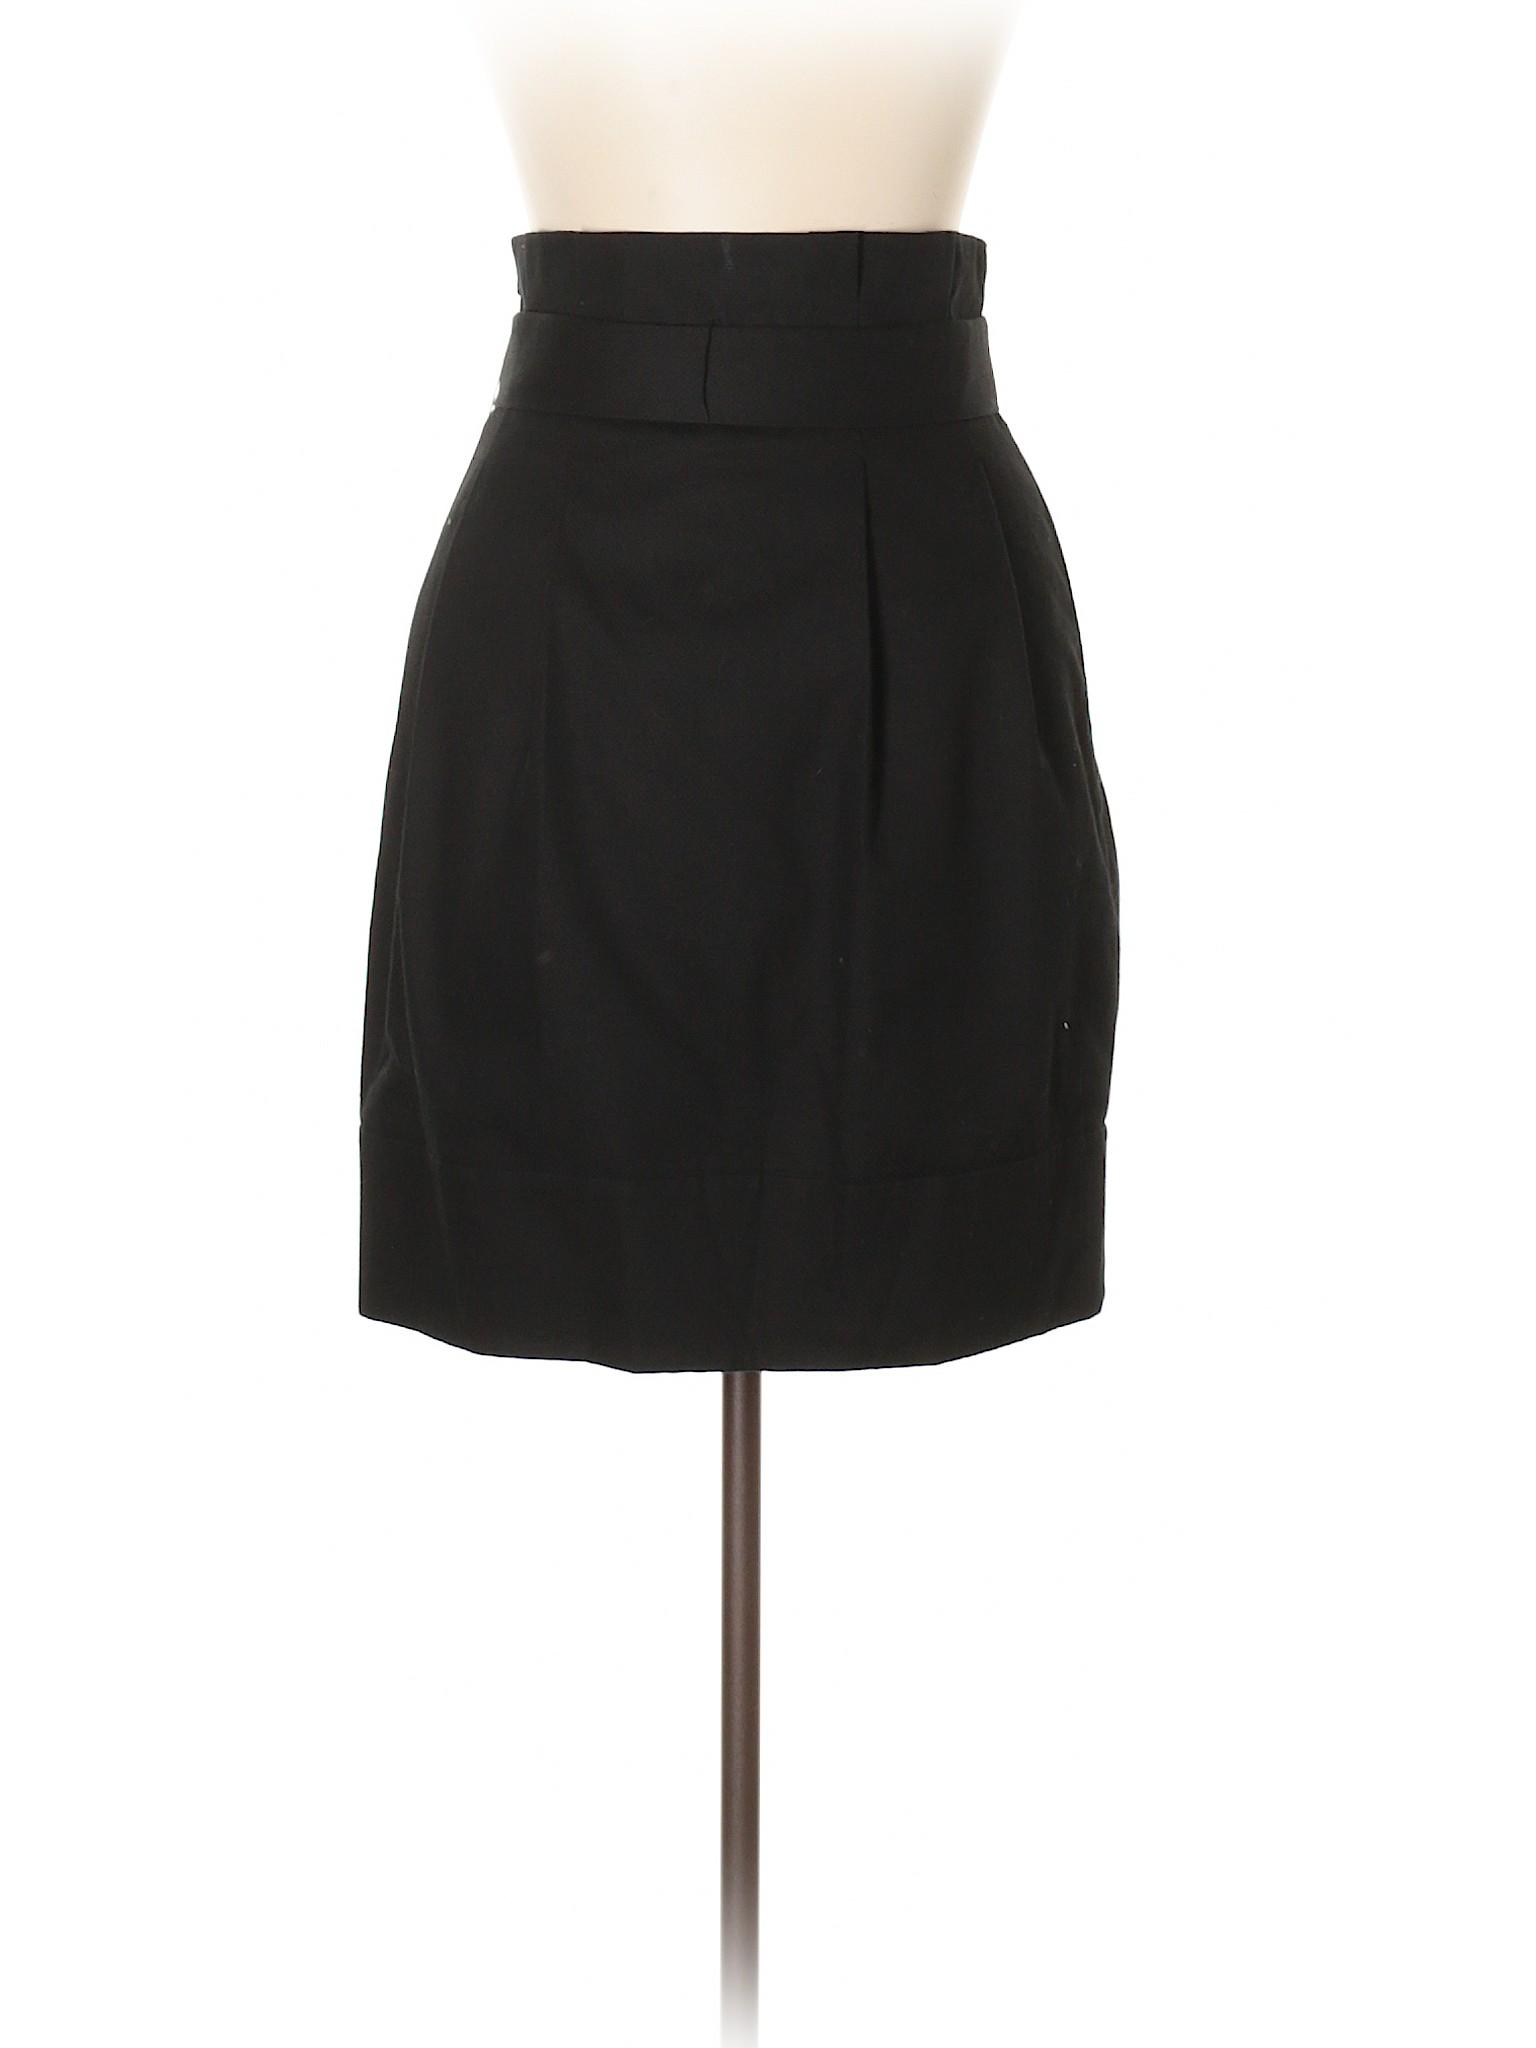 Boutique BCBGMAXAZRIA Casual Skirt BCBGMAXAZRIA Casual Skirt Boutique ZxxwfSUq